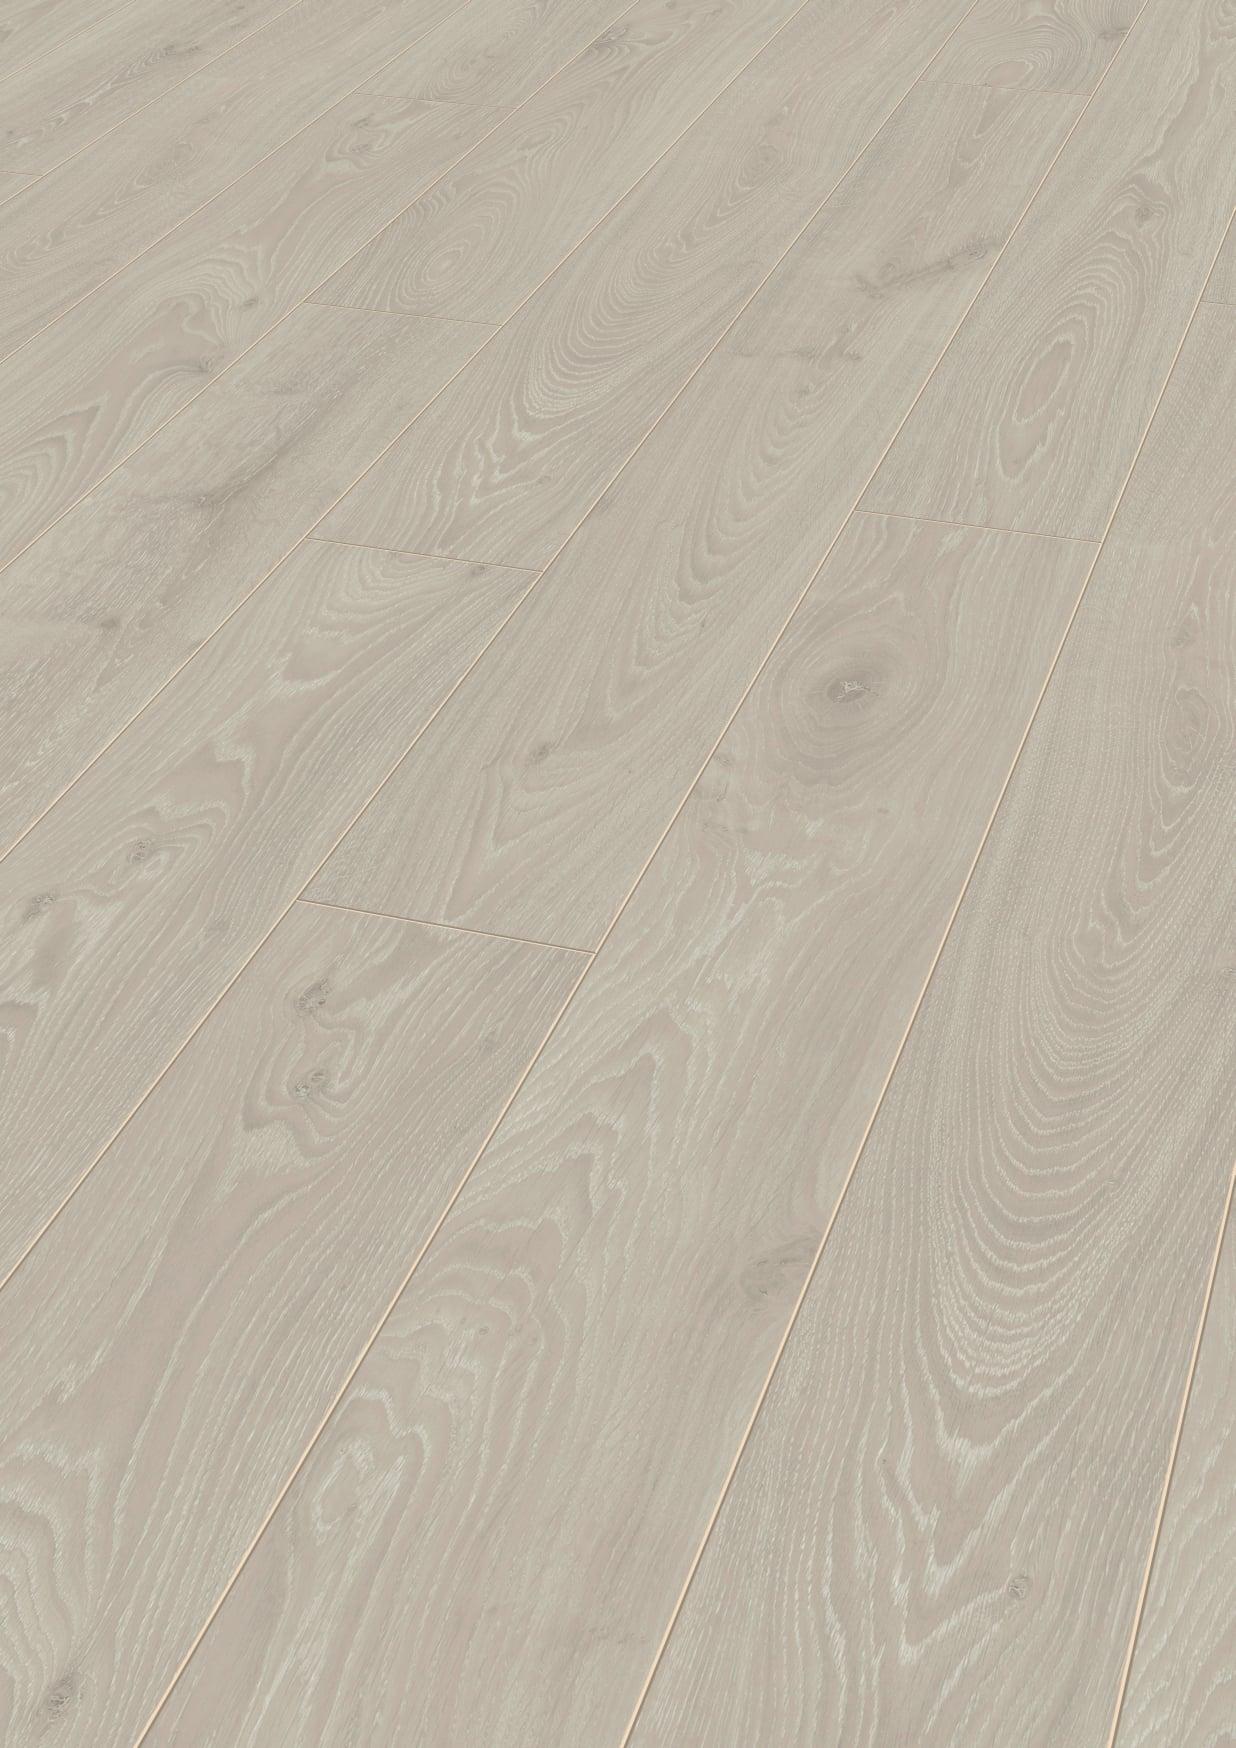 Kronotex amazon timeless oak beige aa floors toronto for Kronotex oak laminate flooring